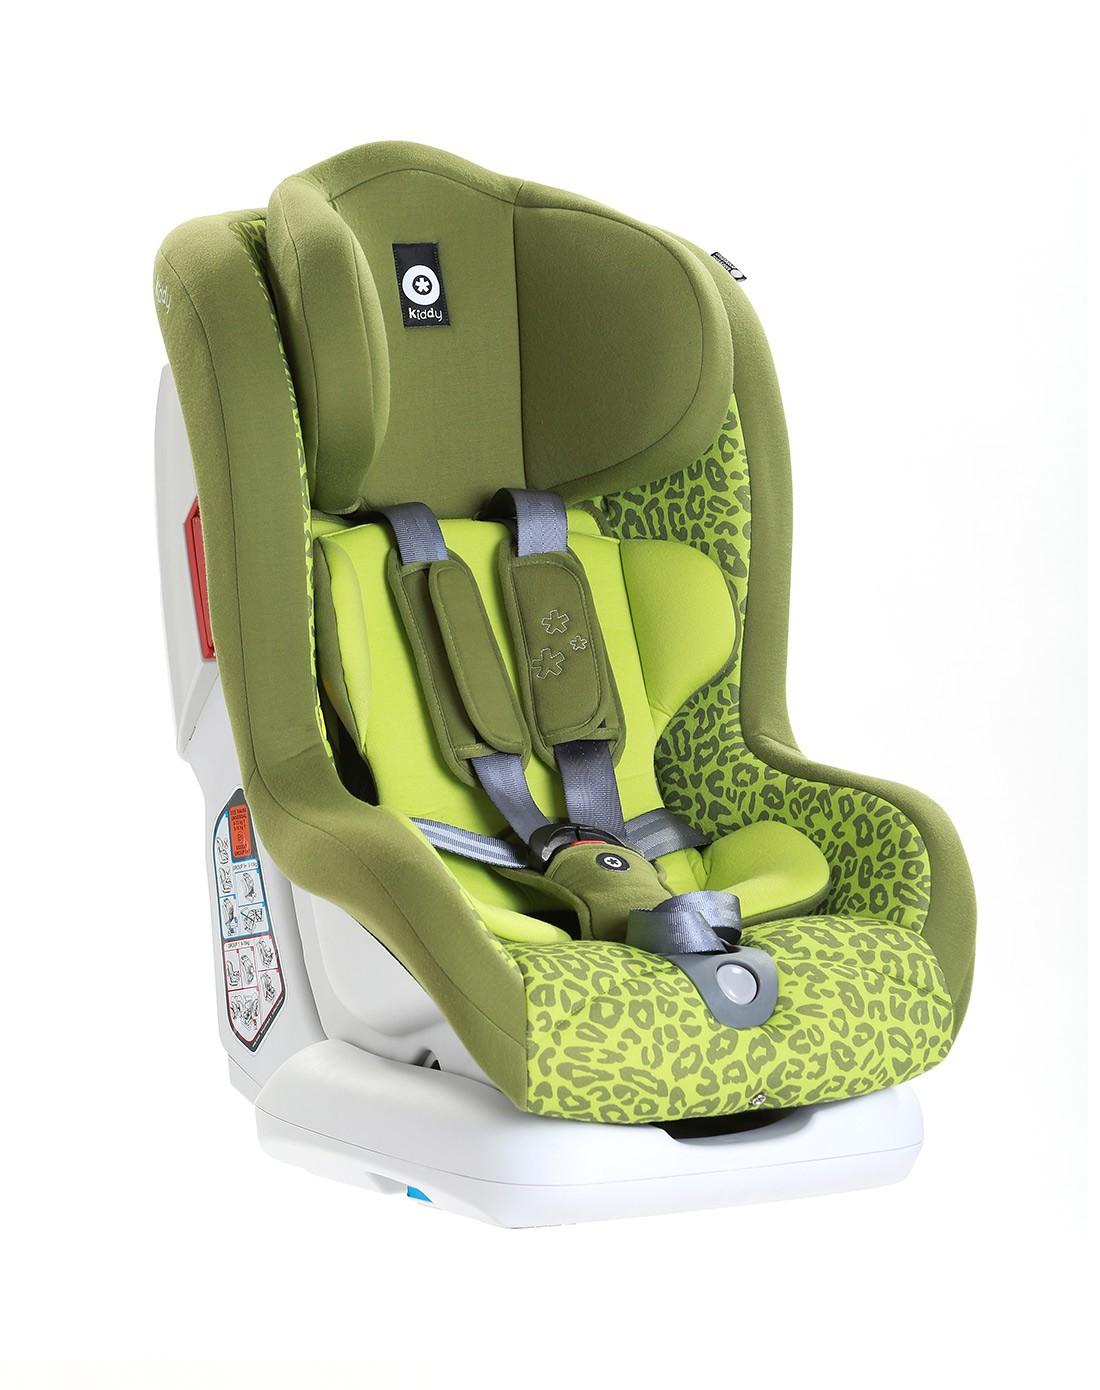 kiddy奇蒂 先锋者儿童安全座椅-嫩草绿(0-4岁)